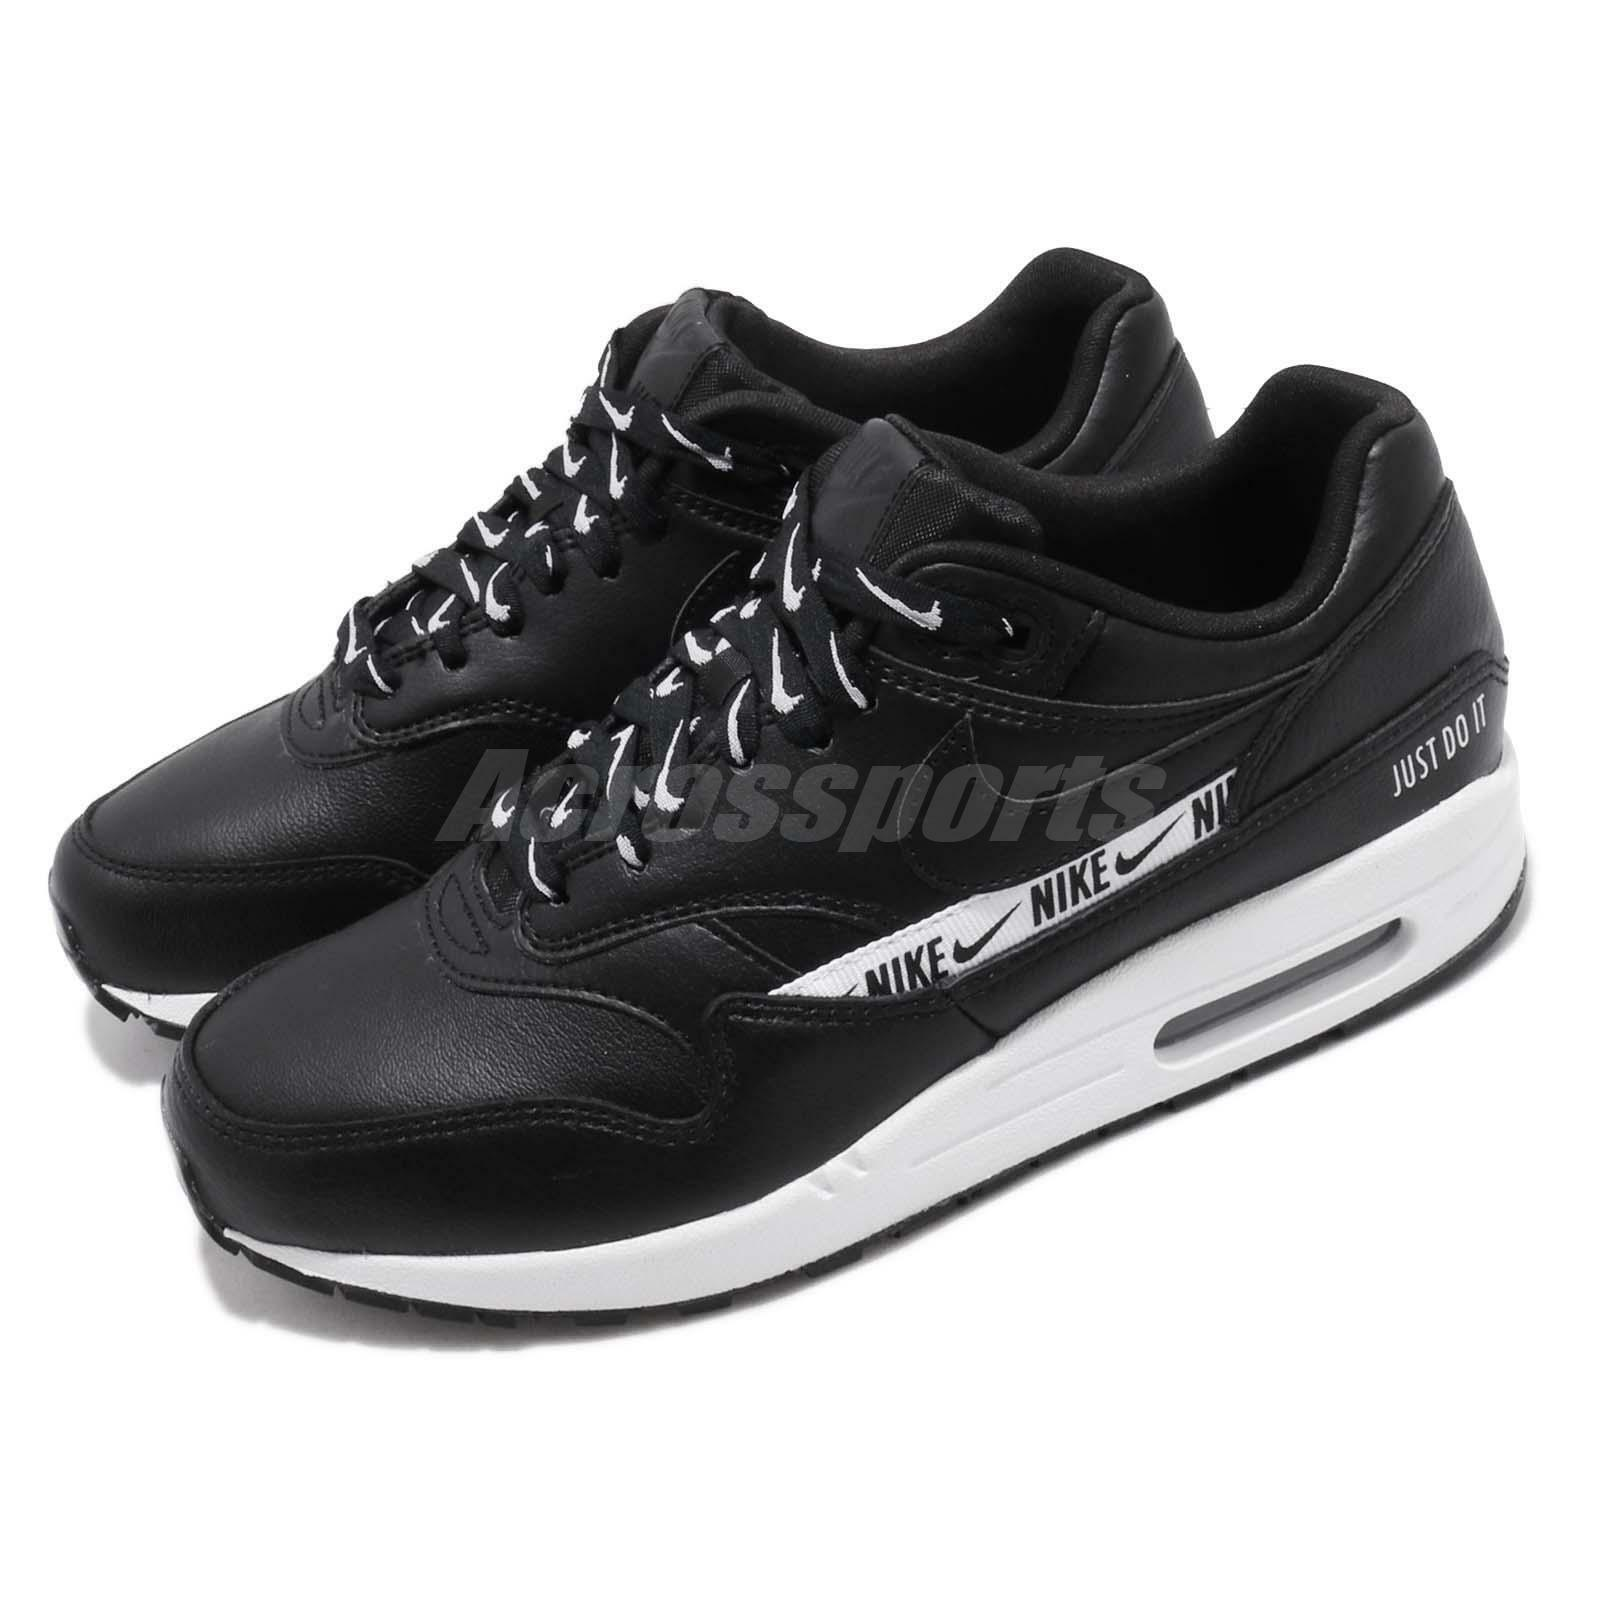 Nike Wmns Air Max 1 Classic Retro Retro Retro Running Shoes Lifestyle Sneakers Pick 1 7e994a